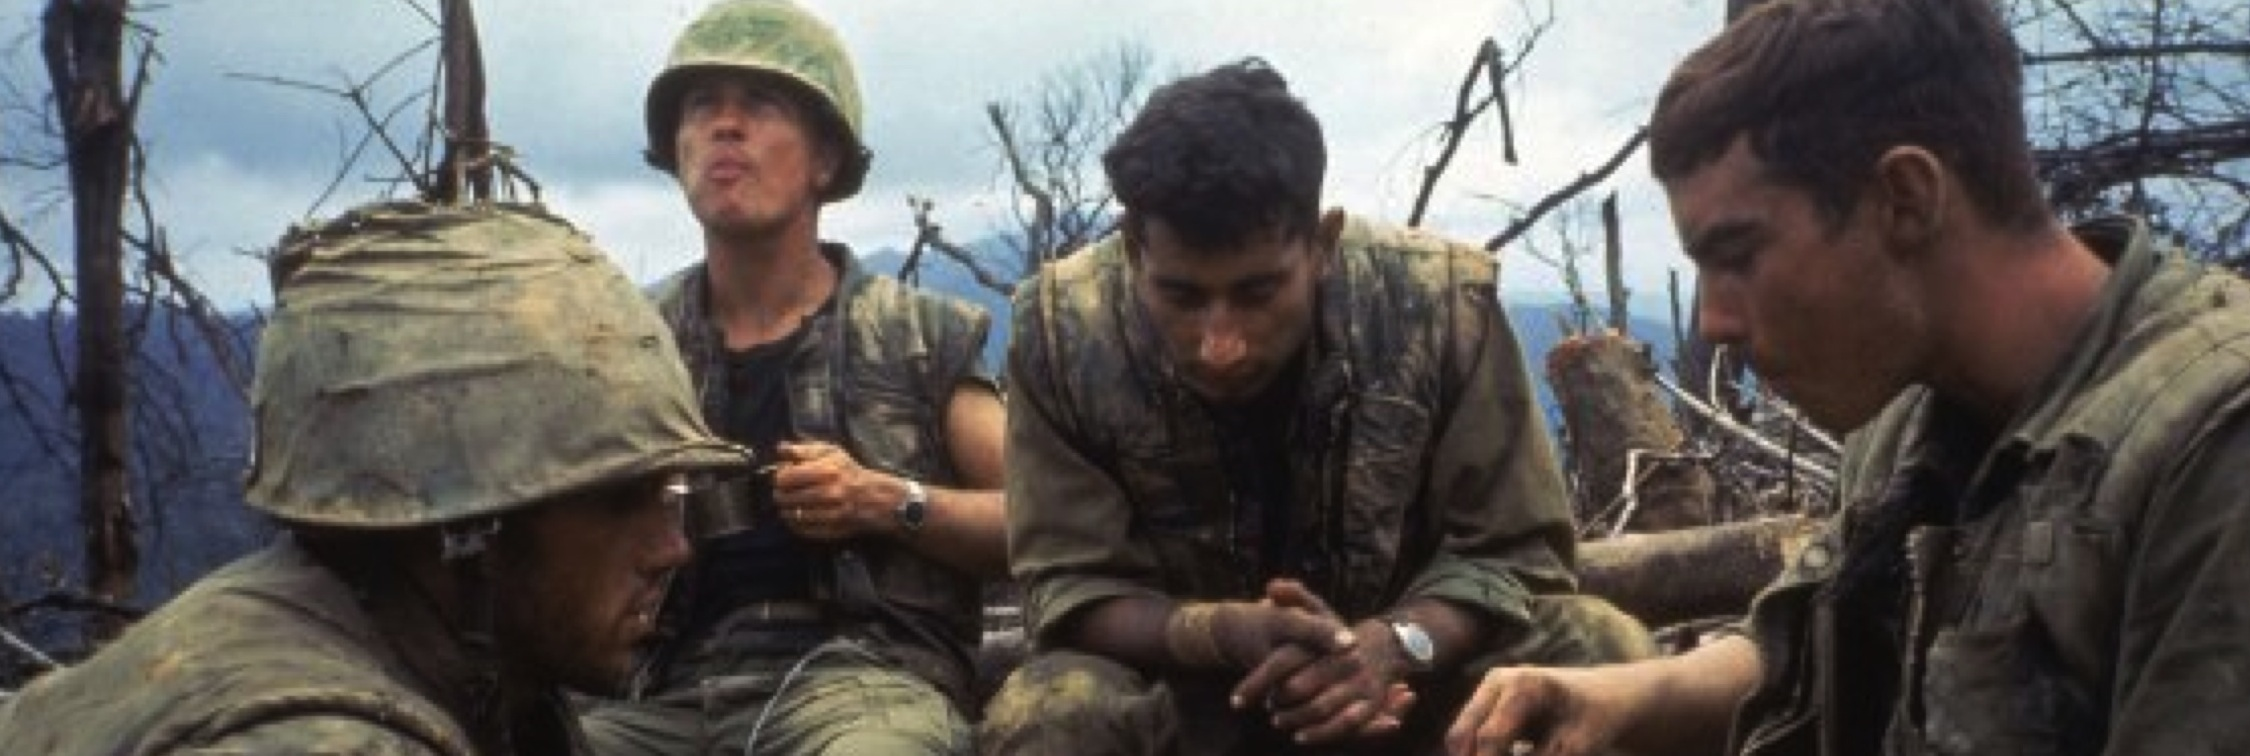 VietnamConflict.jpg